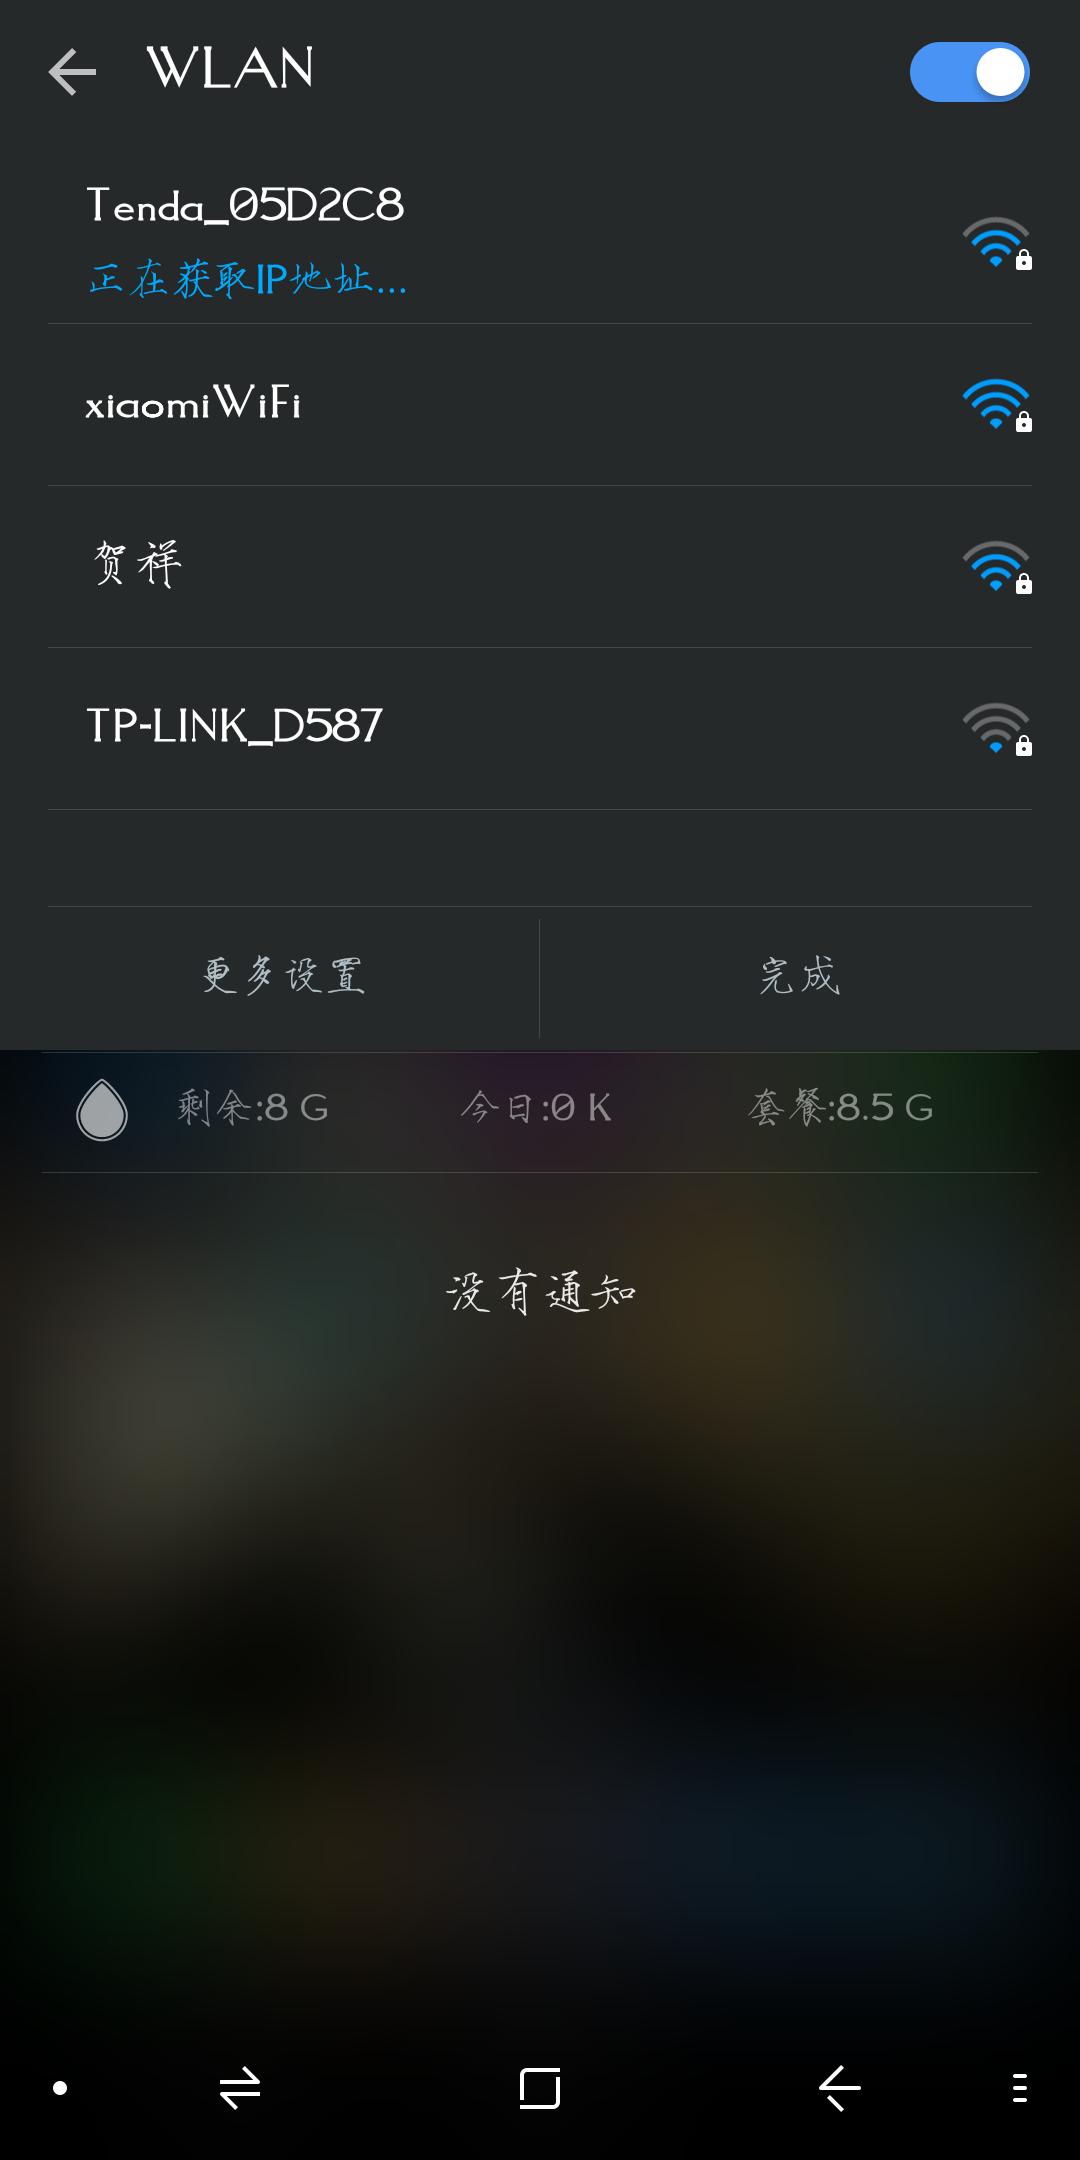 Screenshot_2018-08-09-09-24-17.png